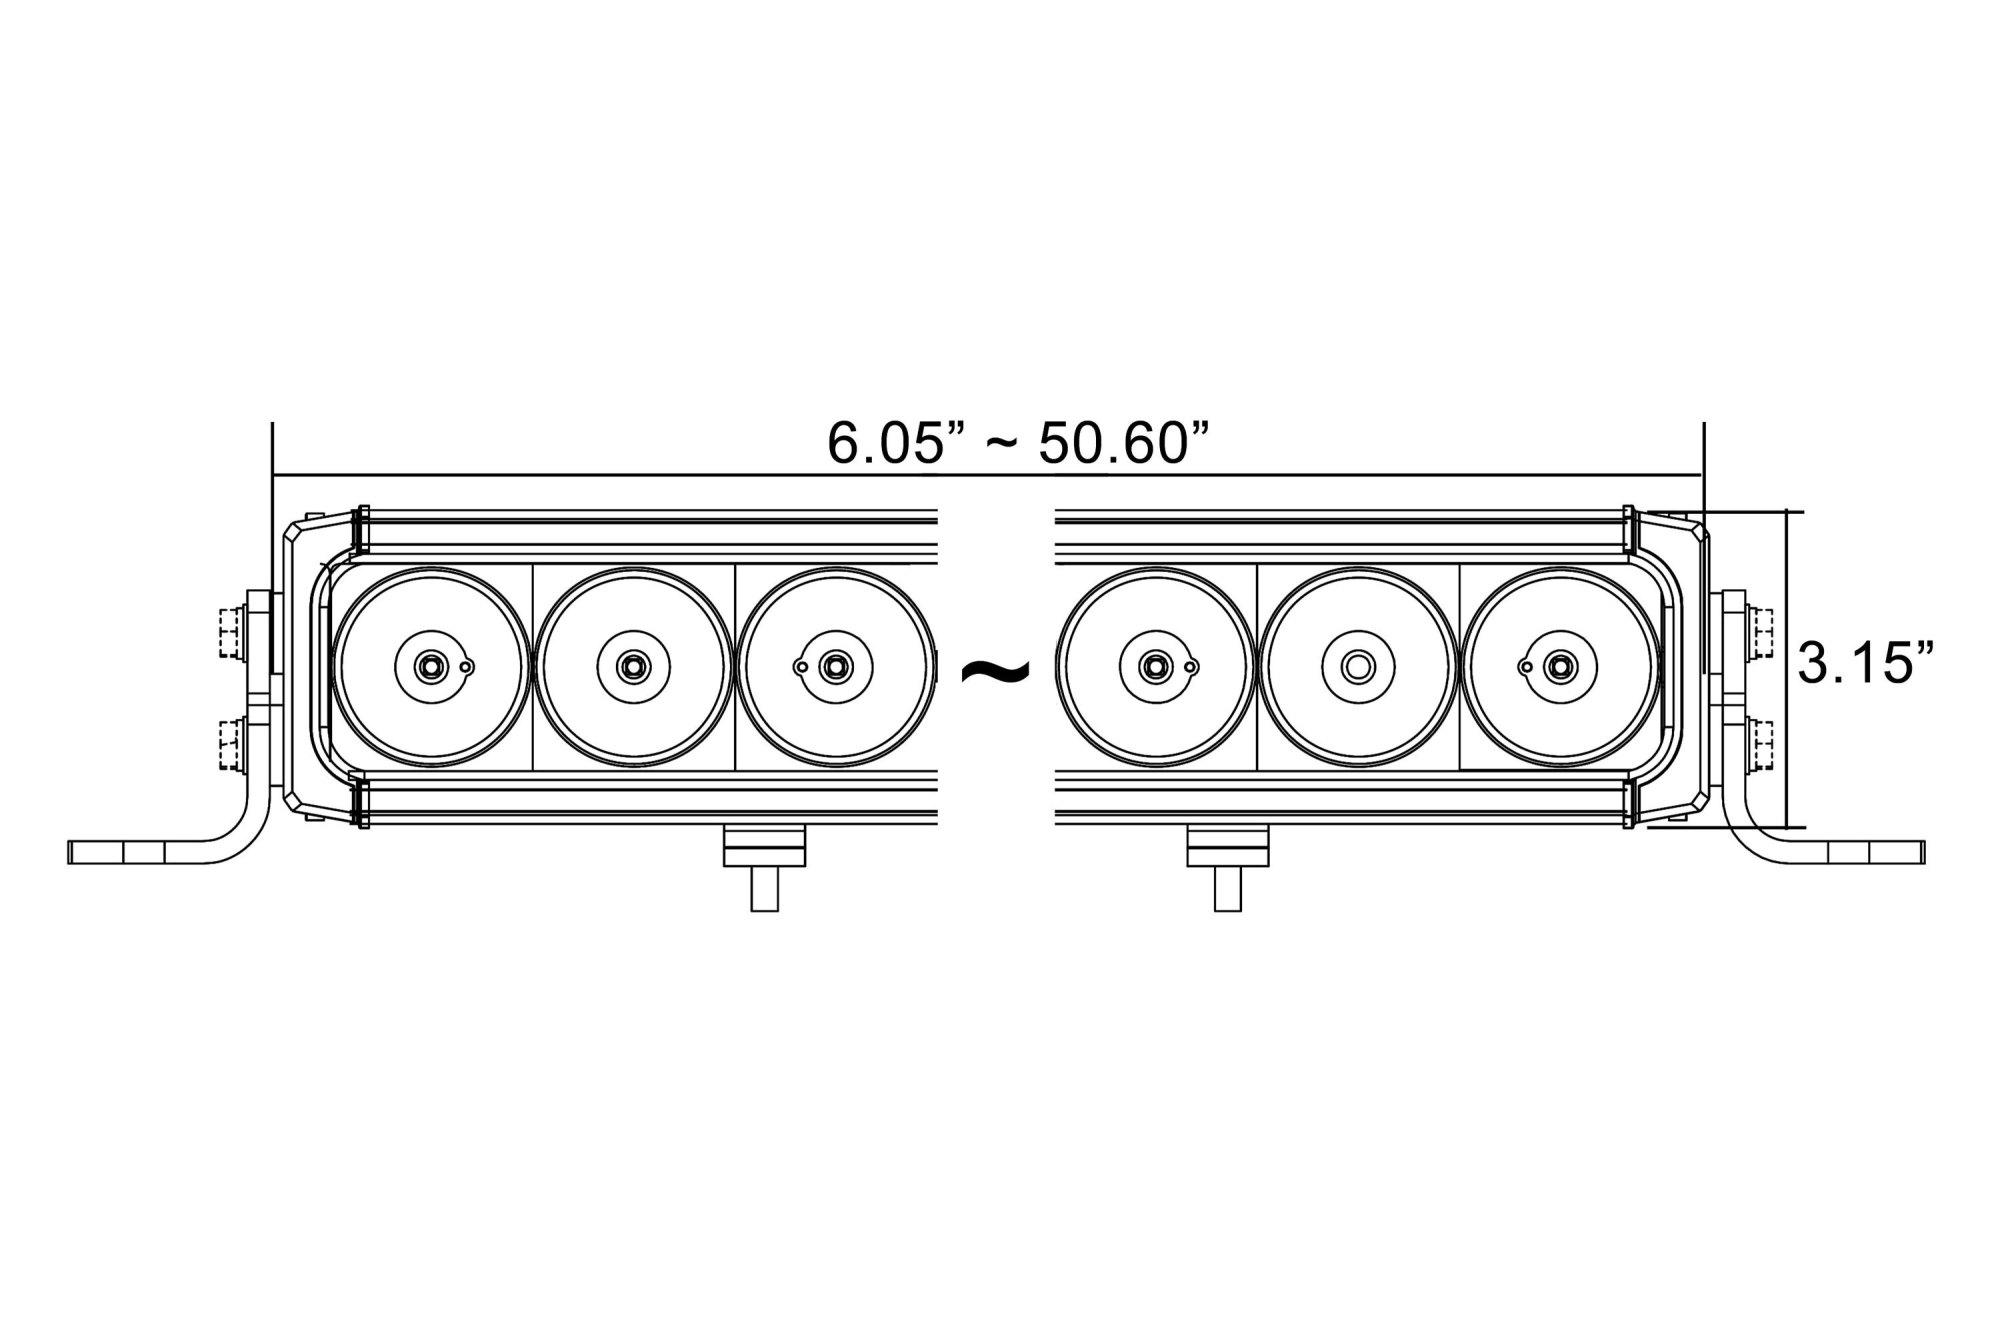 hight resolution of  x xpi 35 90w mixed beam led light bar